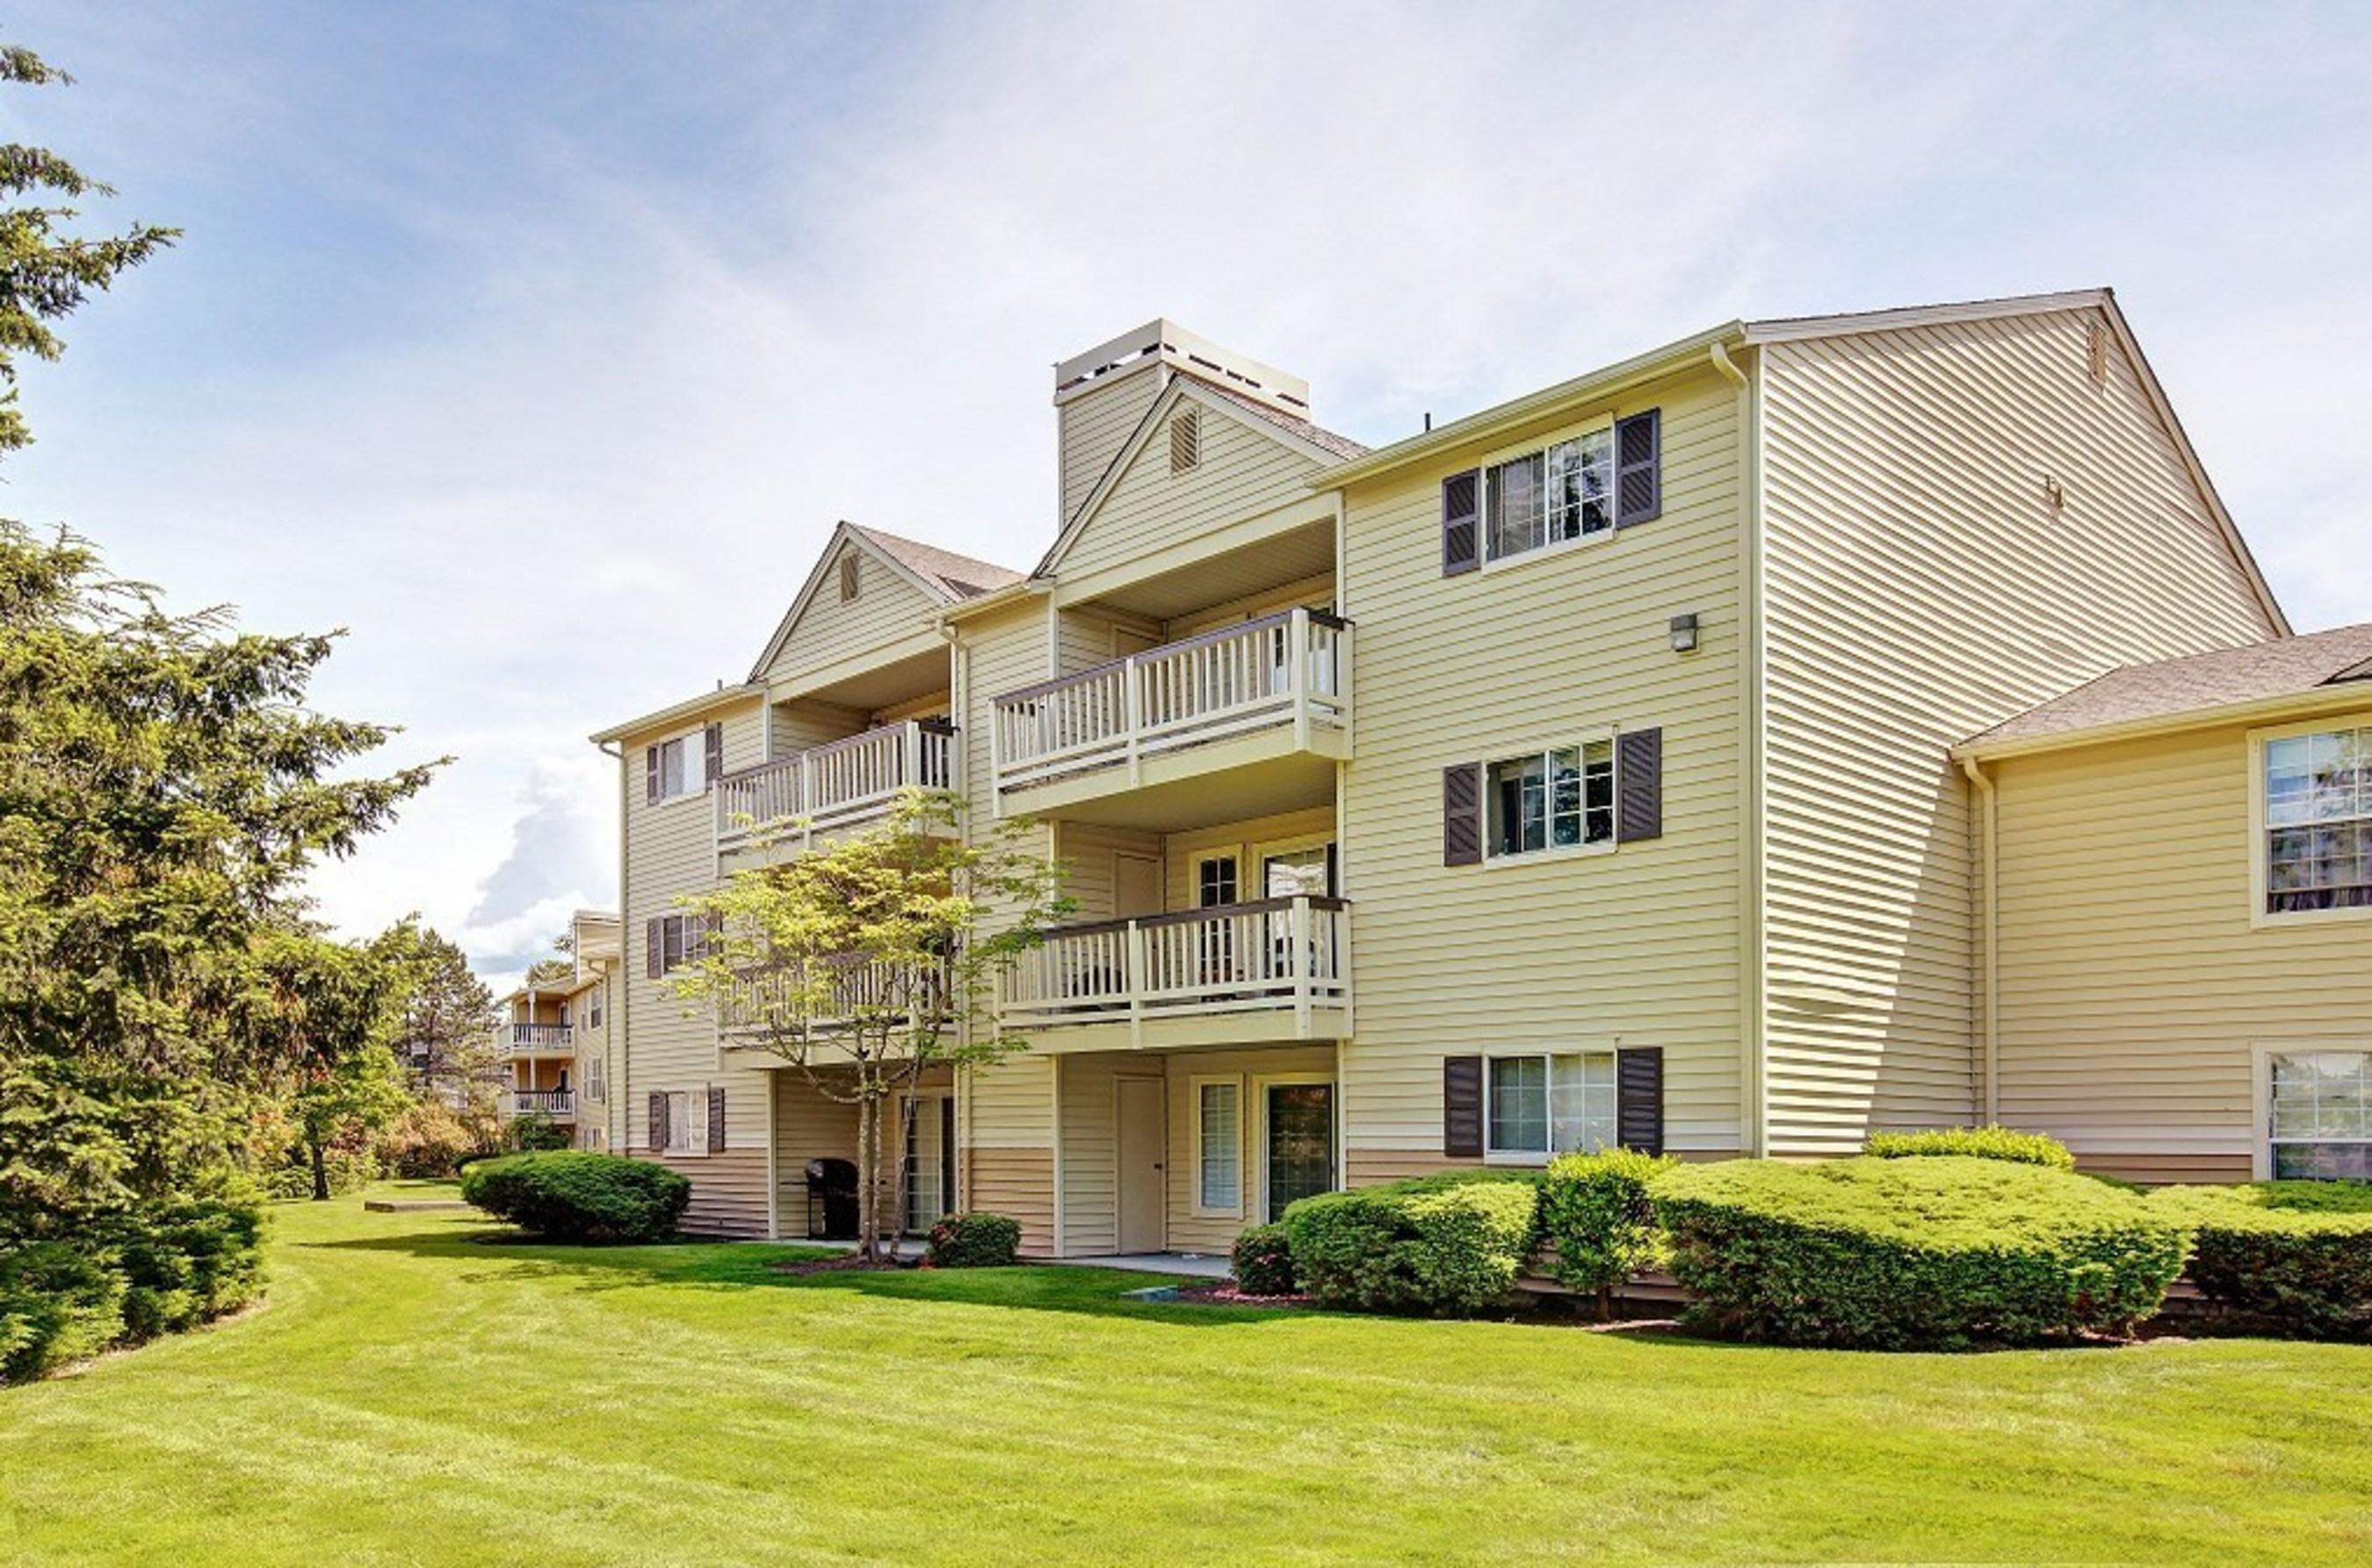 Waters Edge Apartments - Kent, Washington